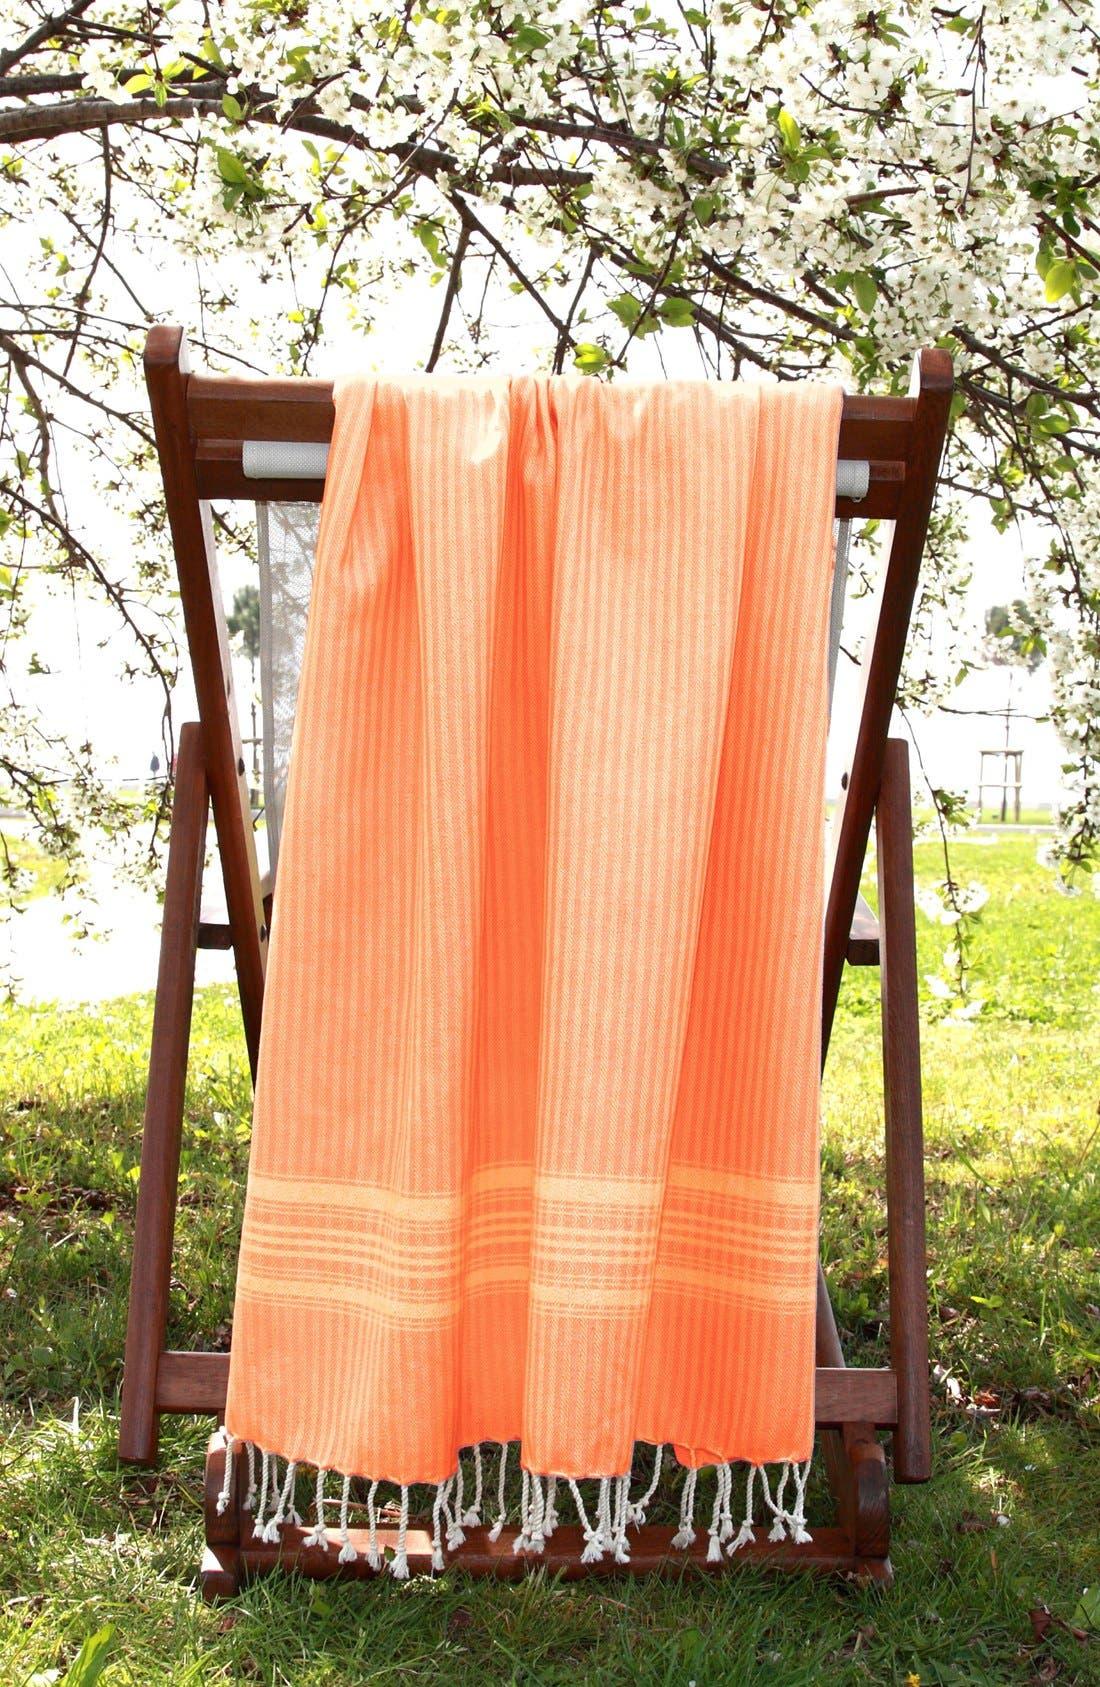 Main Image - Linum Home Textiles 'Luxe Herringbone' Turkish Pestemal Towel